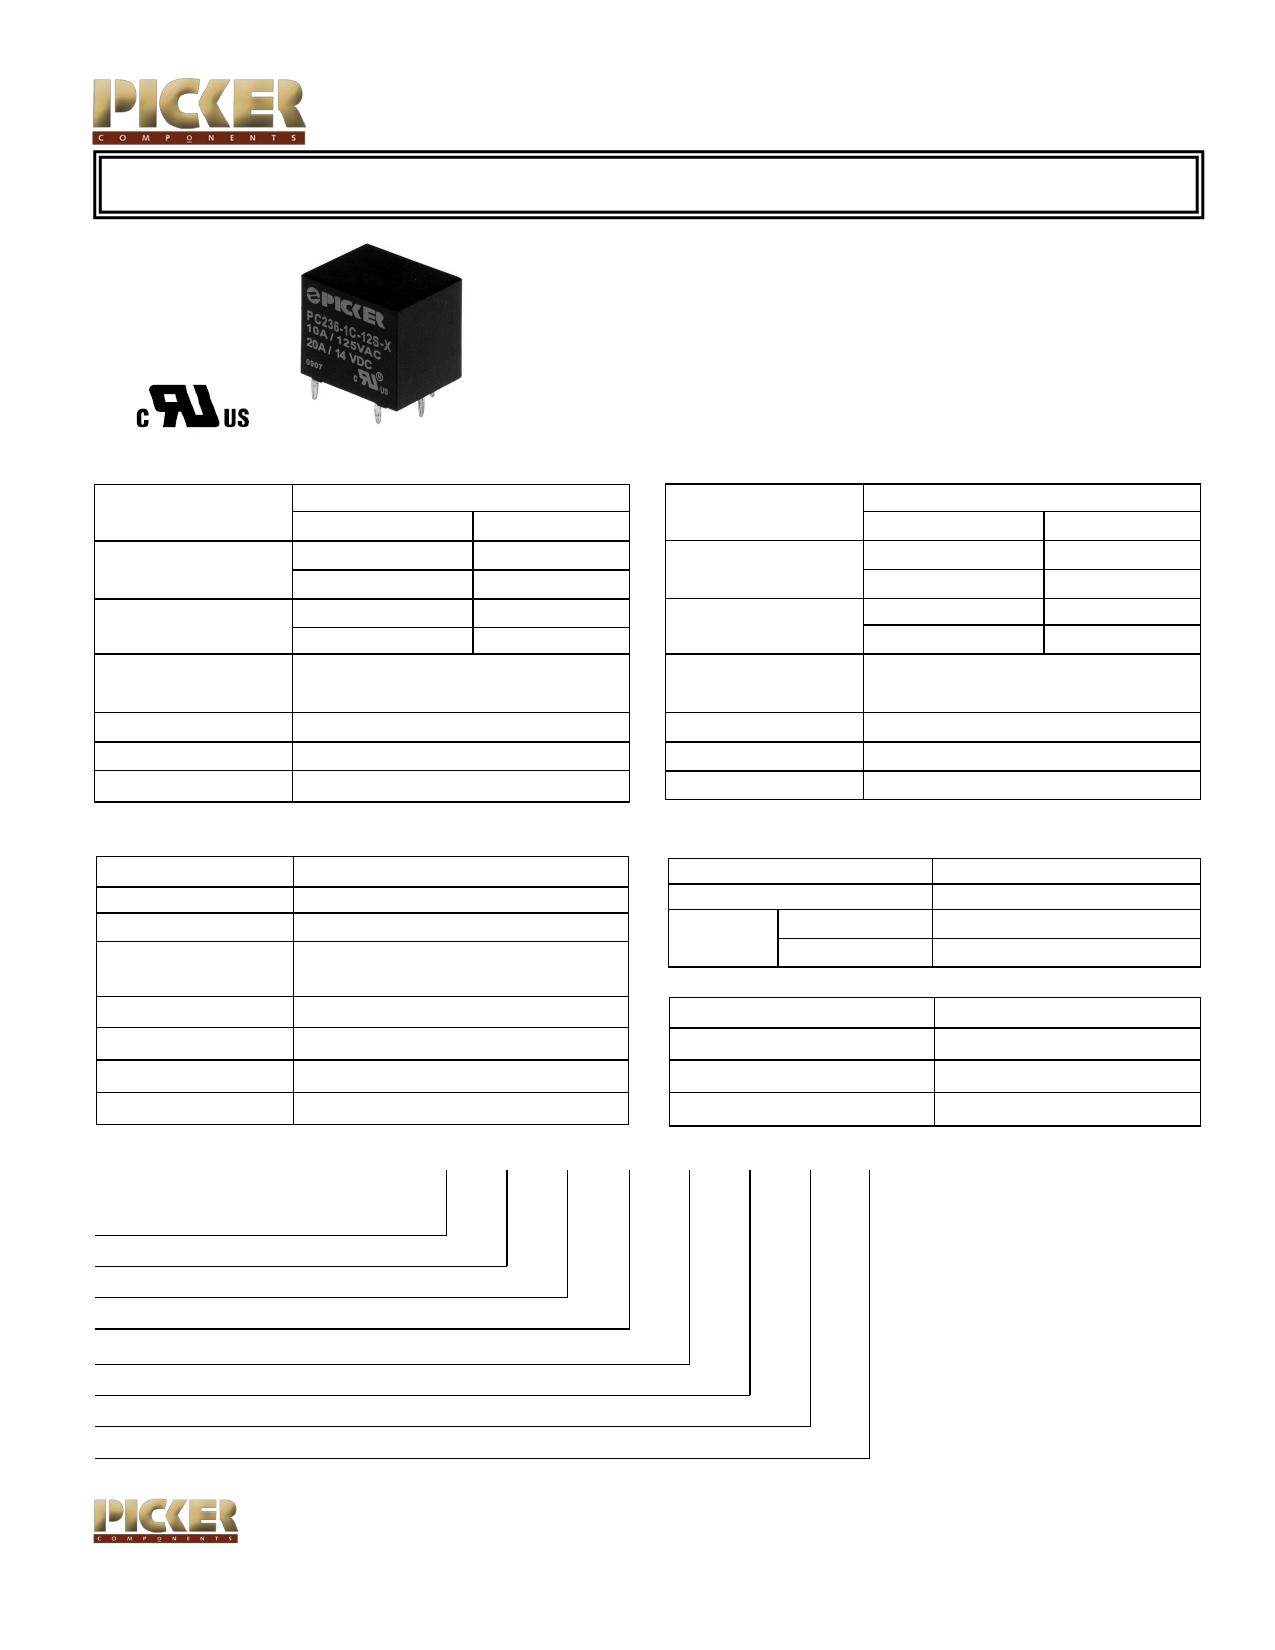 PC236 datasheet